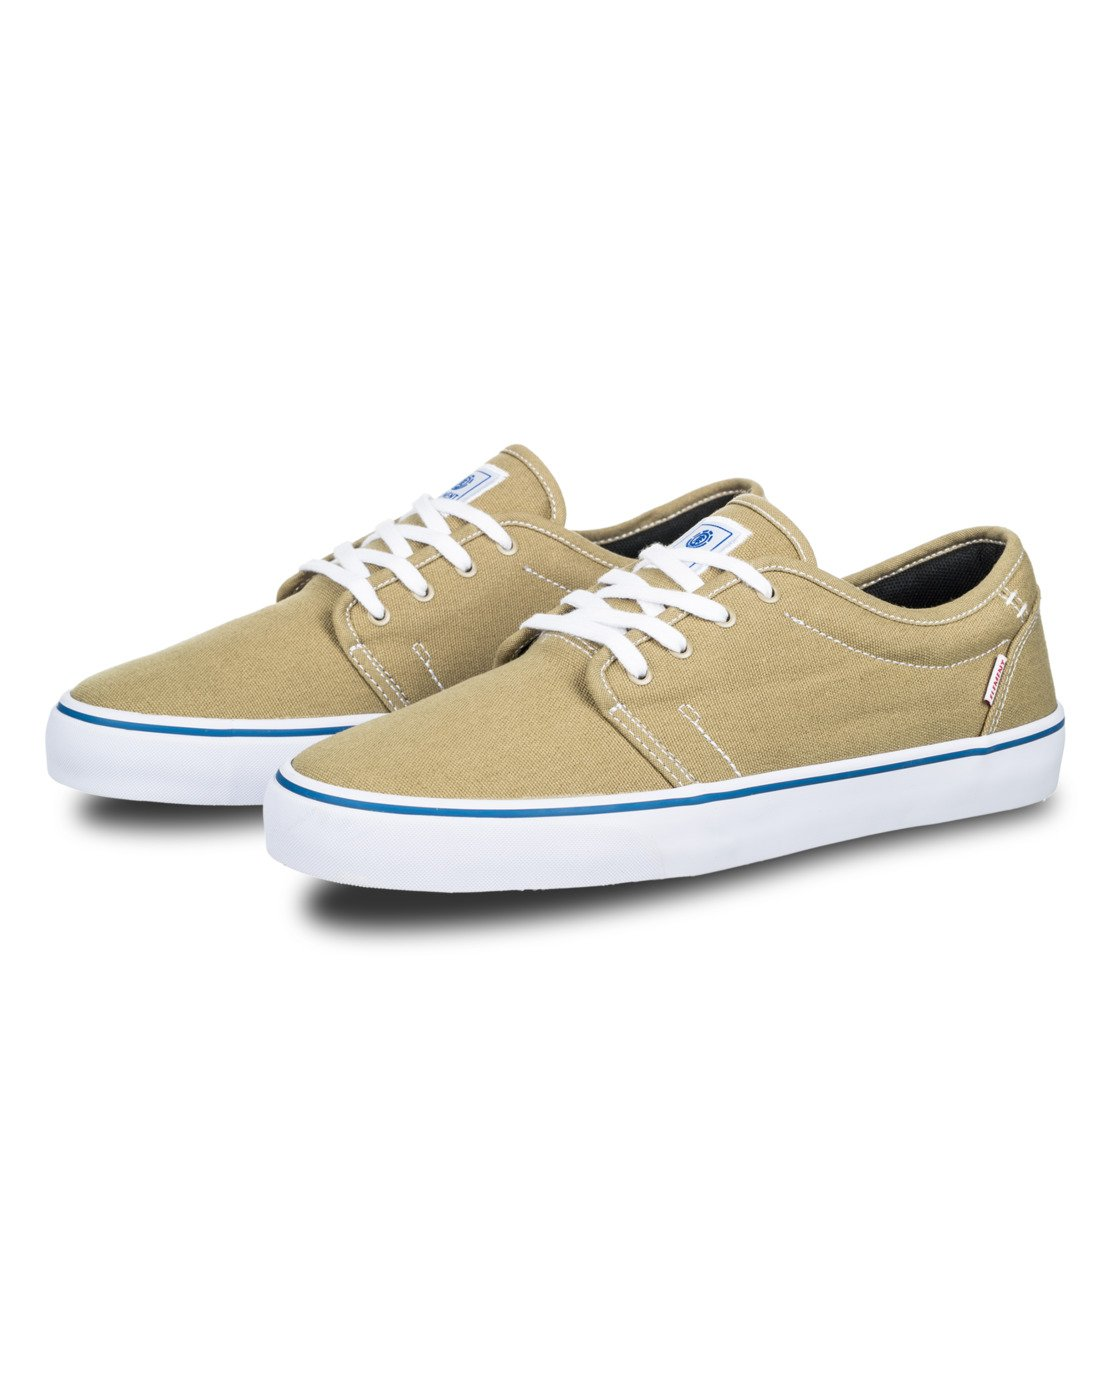 1 Darwin - Shoes for Men Brown W6DAR101 Element